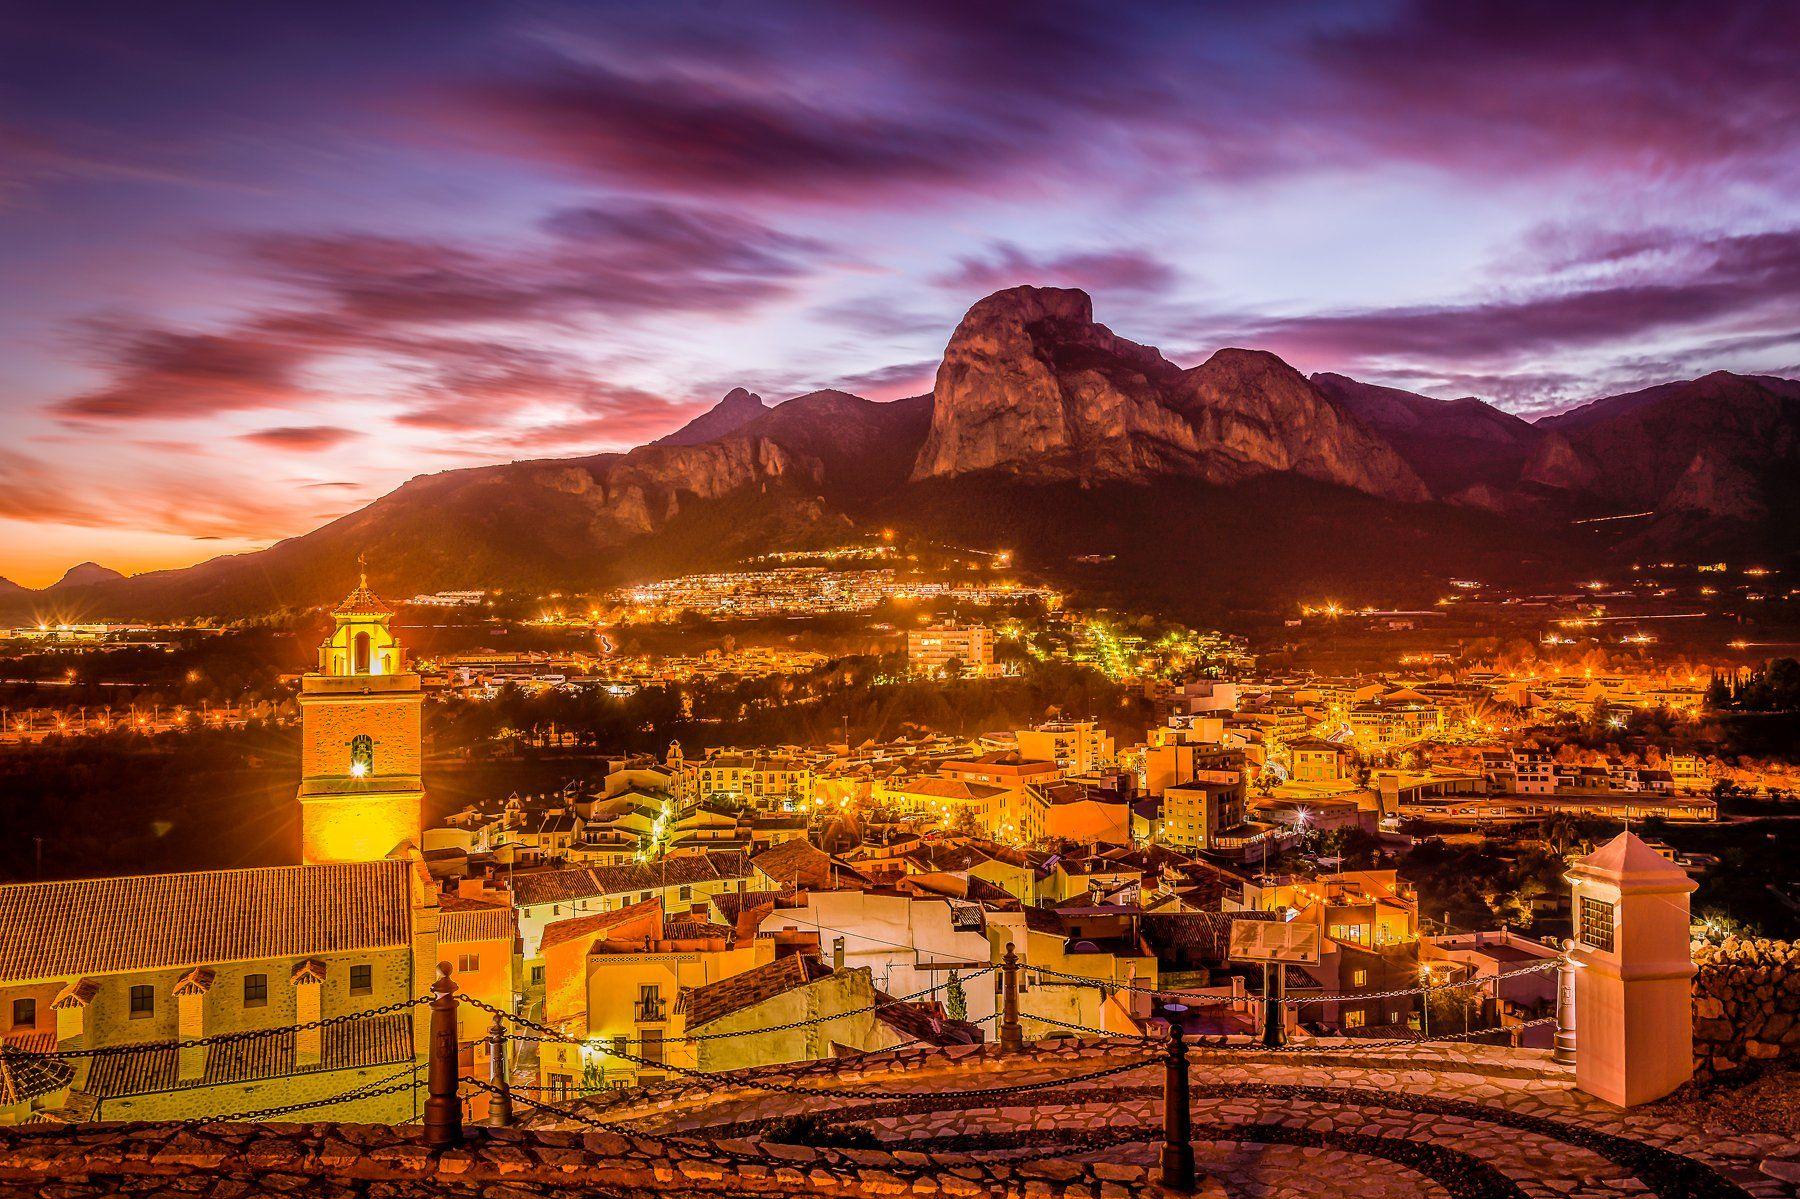 polop de la marina, alicante, spain, night city, city and mountains, Виктор